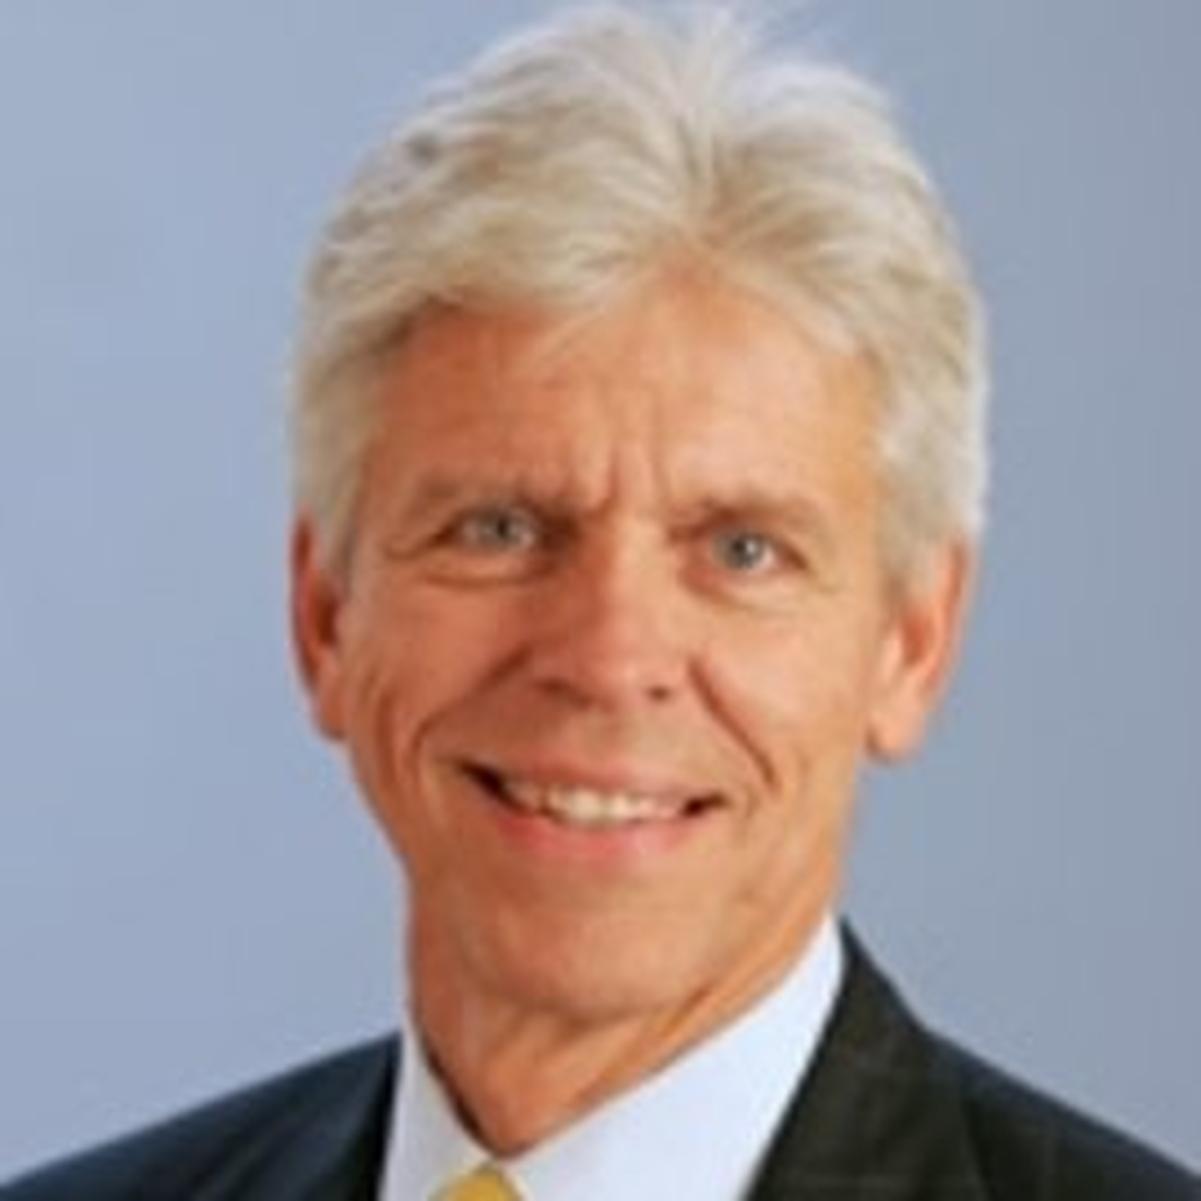 Thomas DeLong